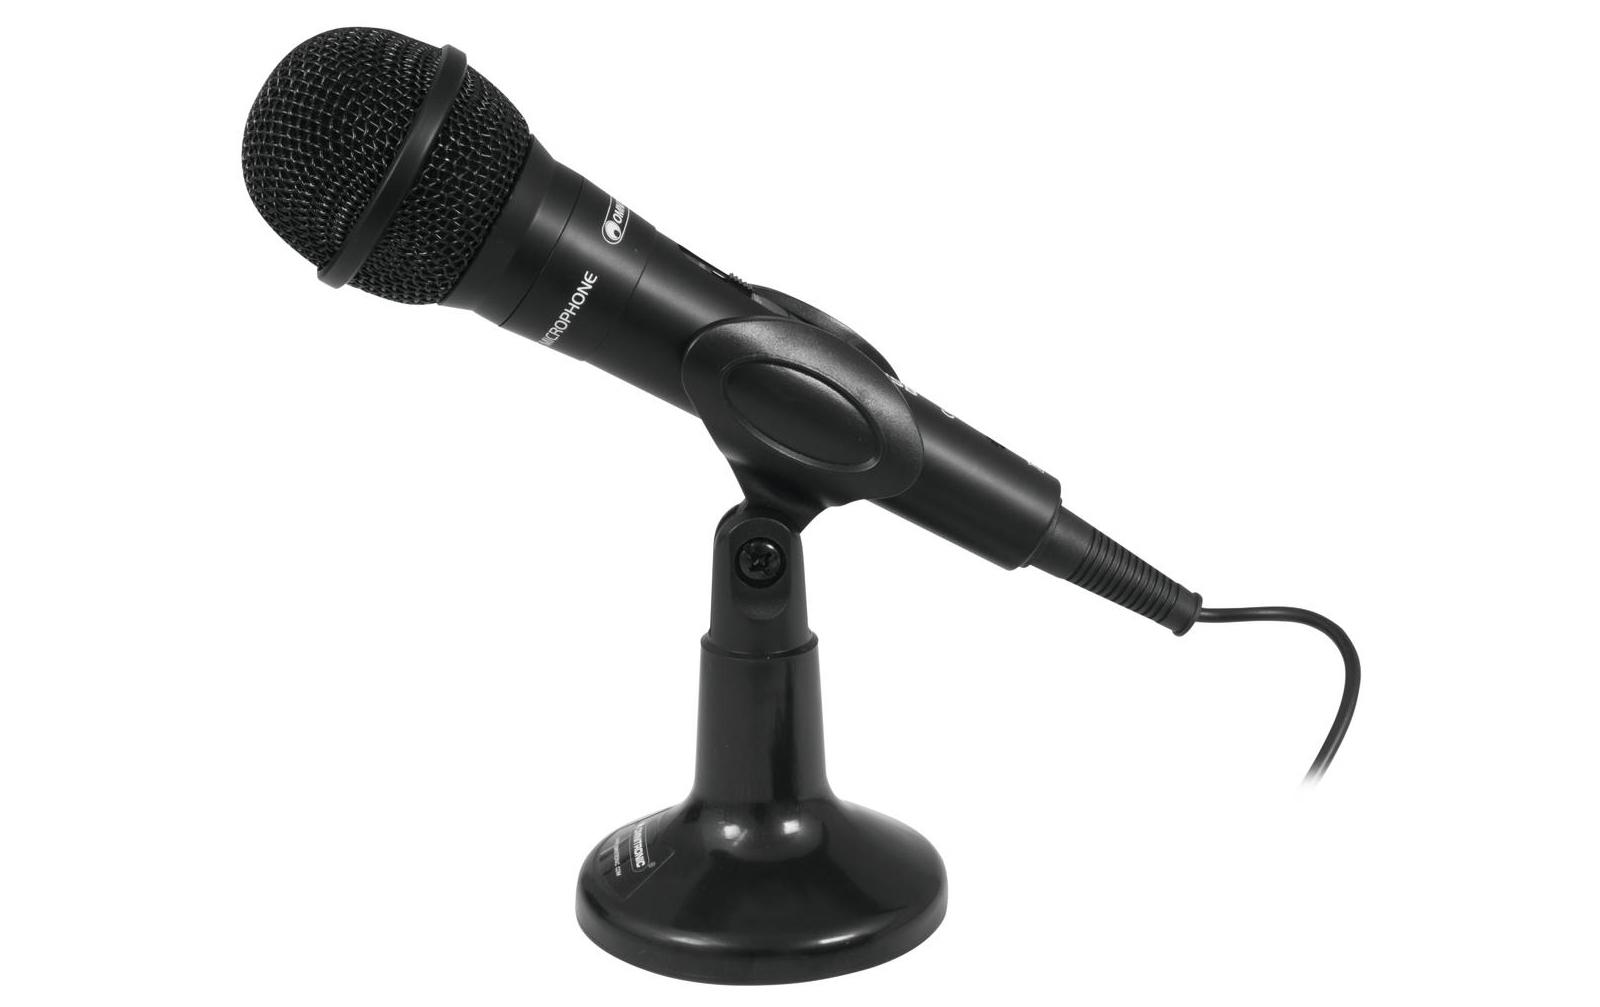 omnitronic-m-22-usb-dynamisches-mikrofon